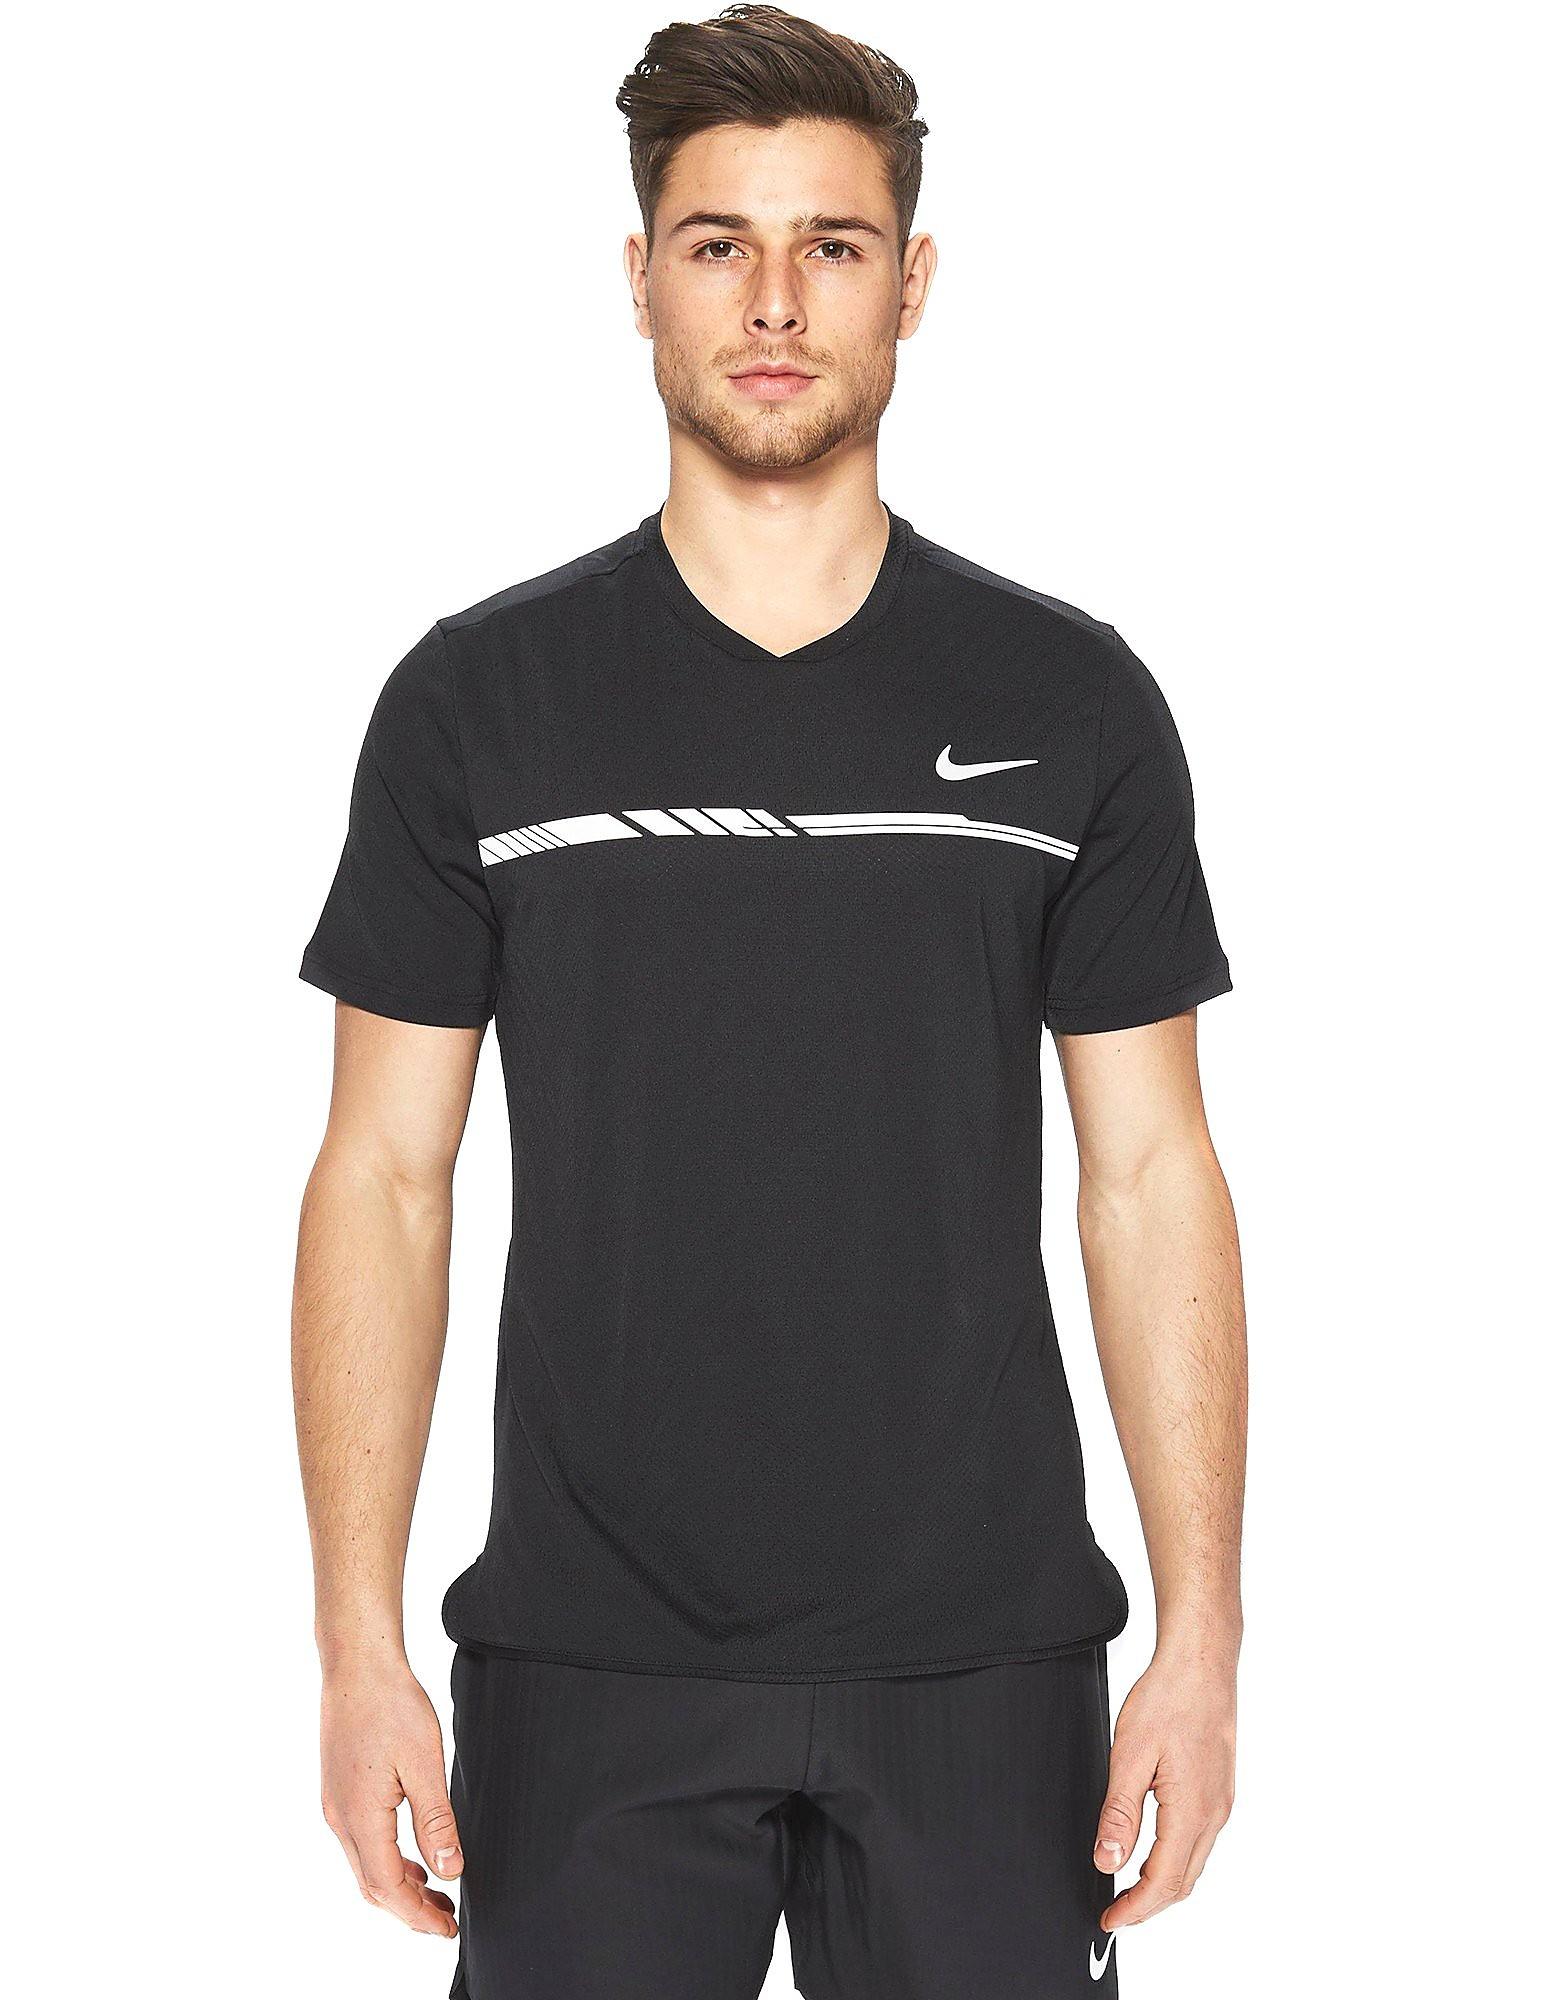 Nike Dry Challenge T-Shirt